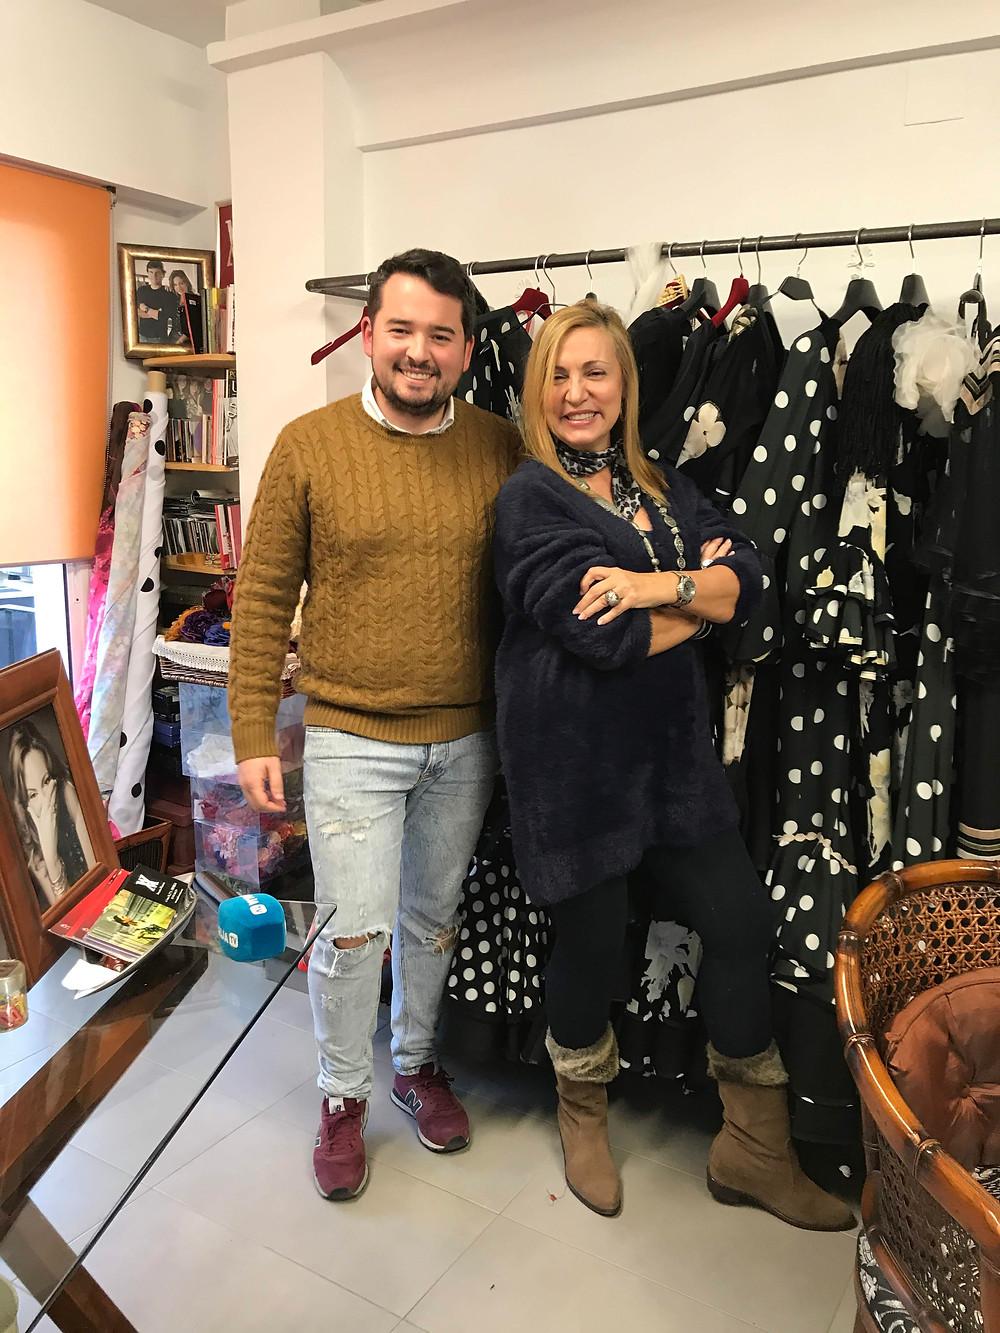 entrevista lebrija tv por cayecruz